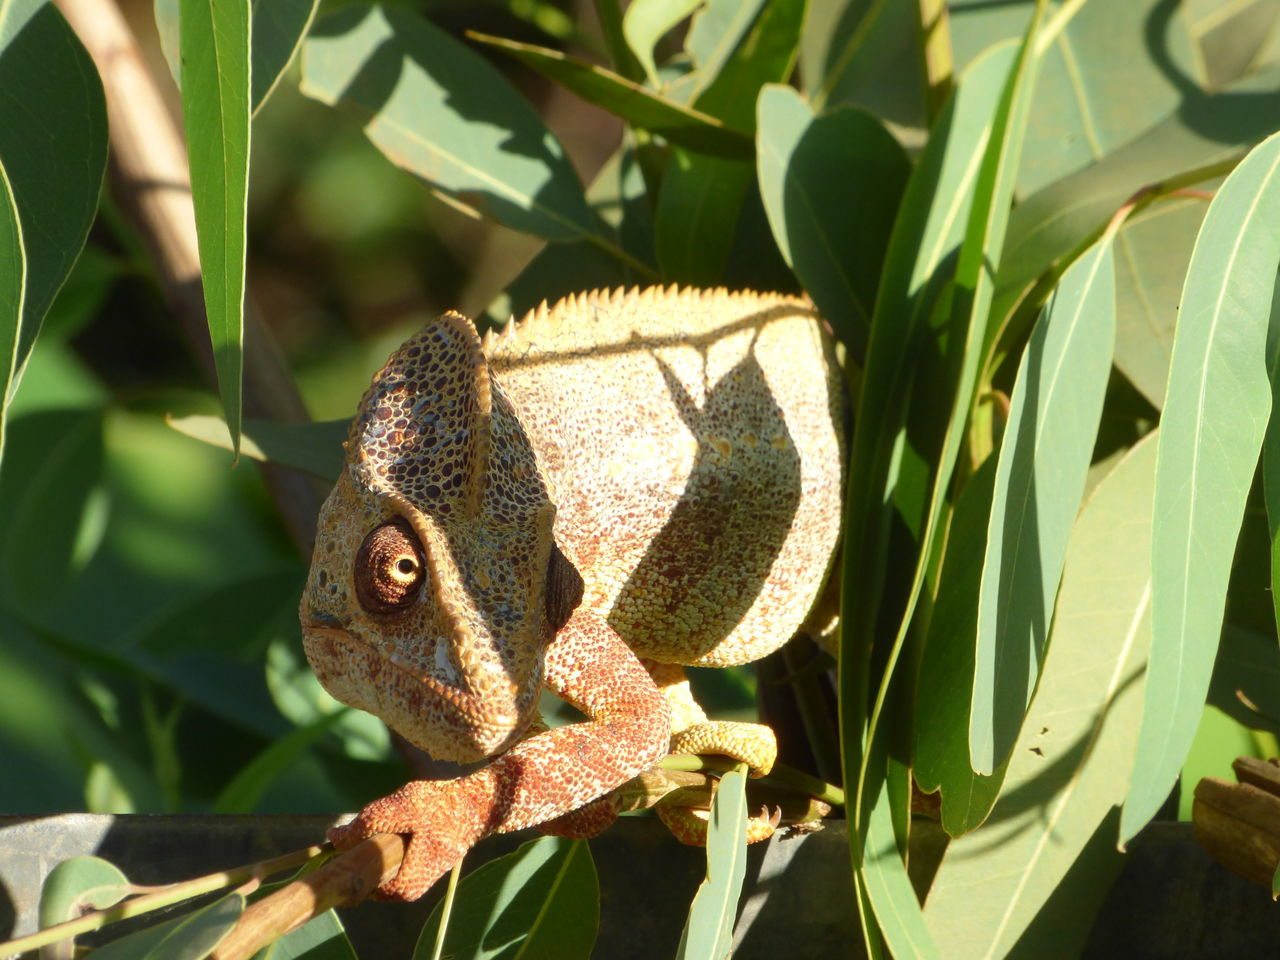 Animals In The Wild Chameleon Madagascar  Mimetism Nature Single Animal Tropical Animal